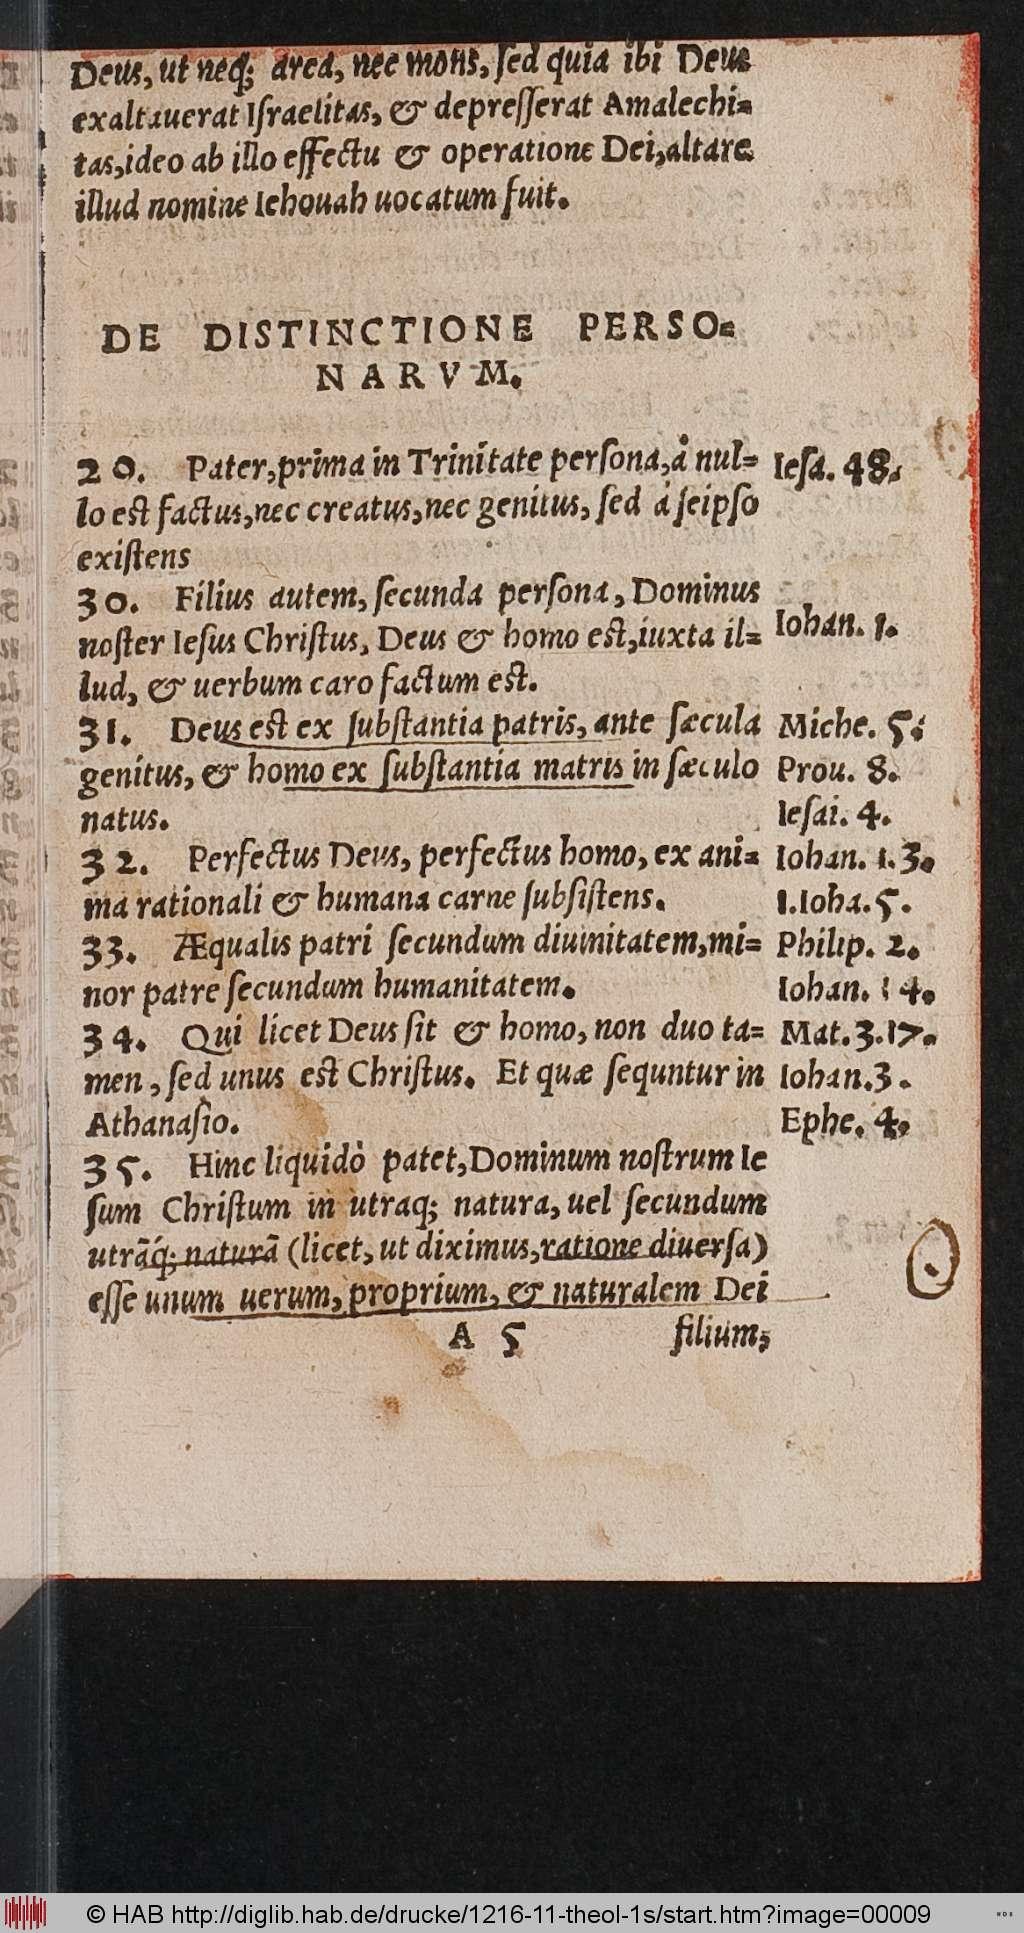 http://diglib.hab.de/drucke/1216-11-theol-1s/00009.jpg